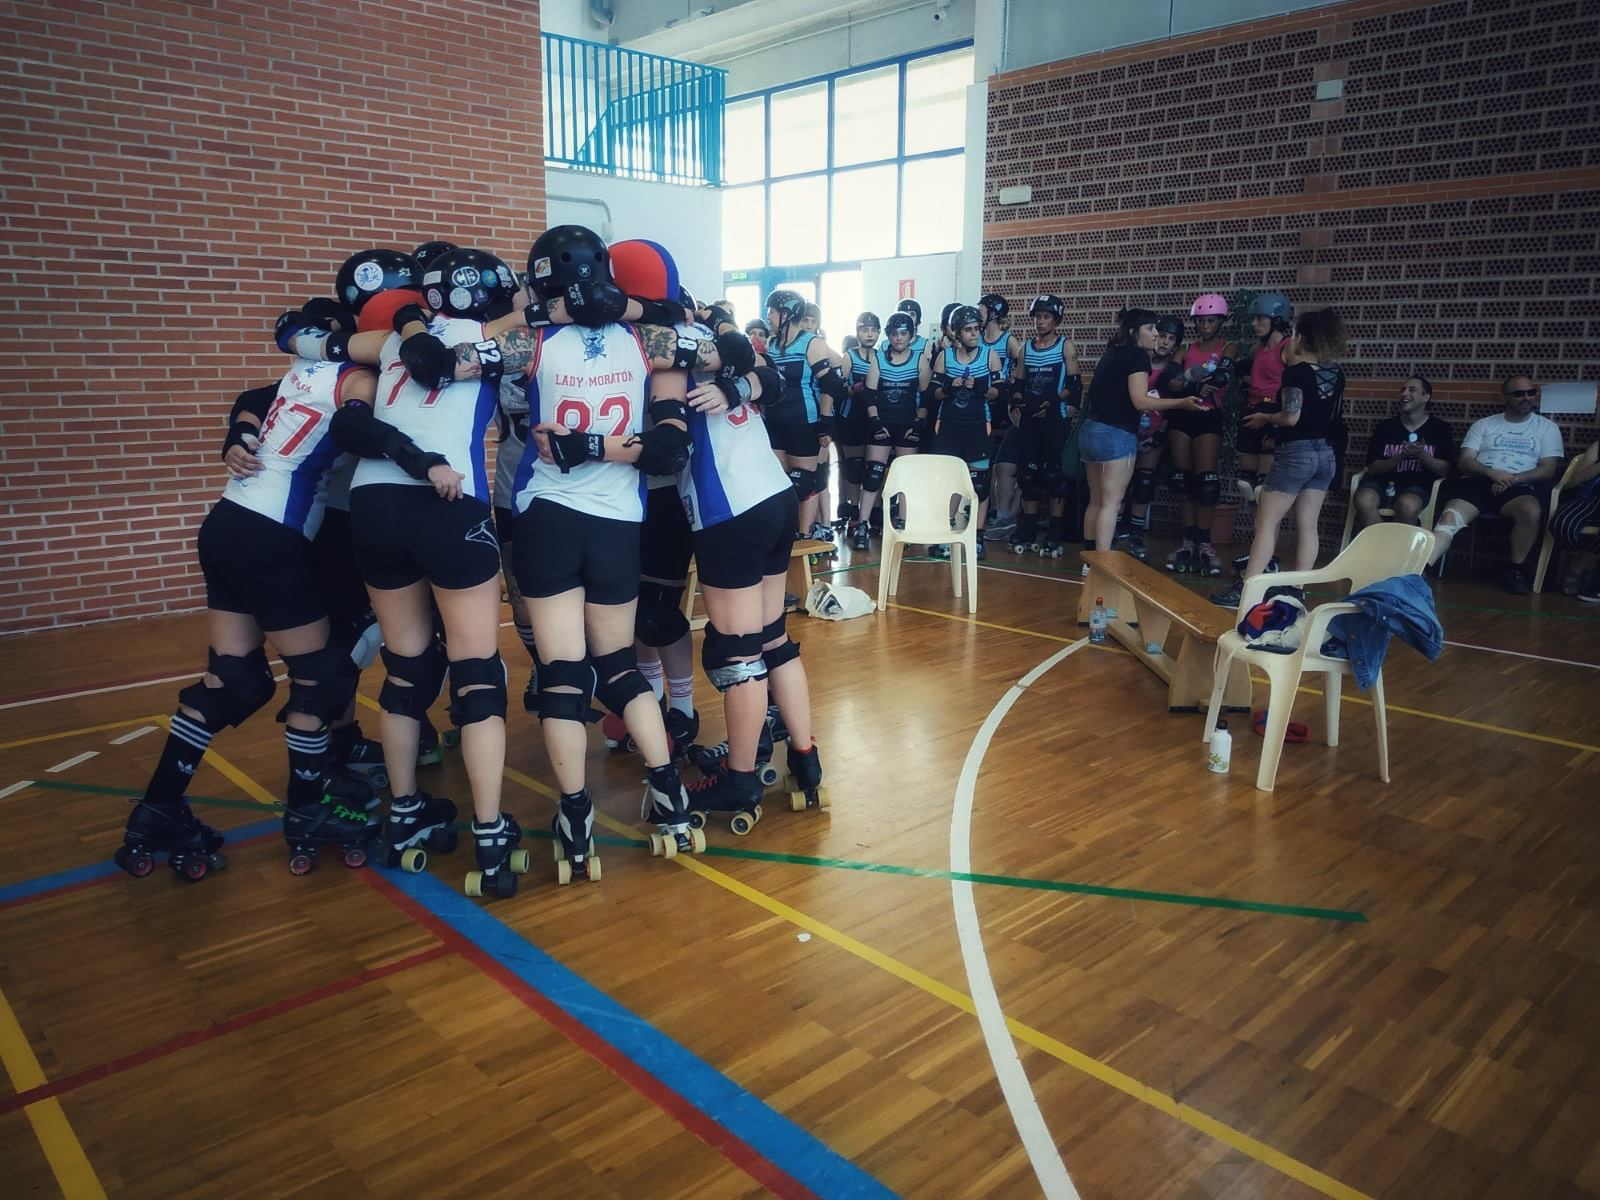 Segunda xornada da Liga Galega de Roller Derby de novo en pistas herculinas / AS BRIGANTIAS